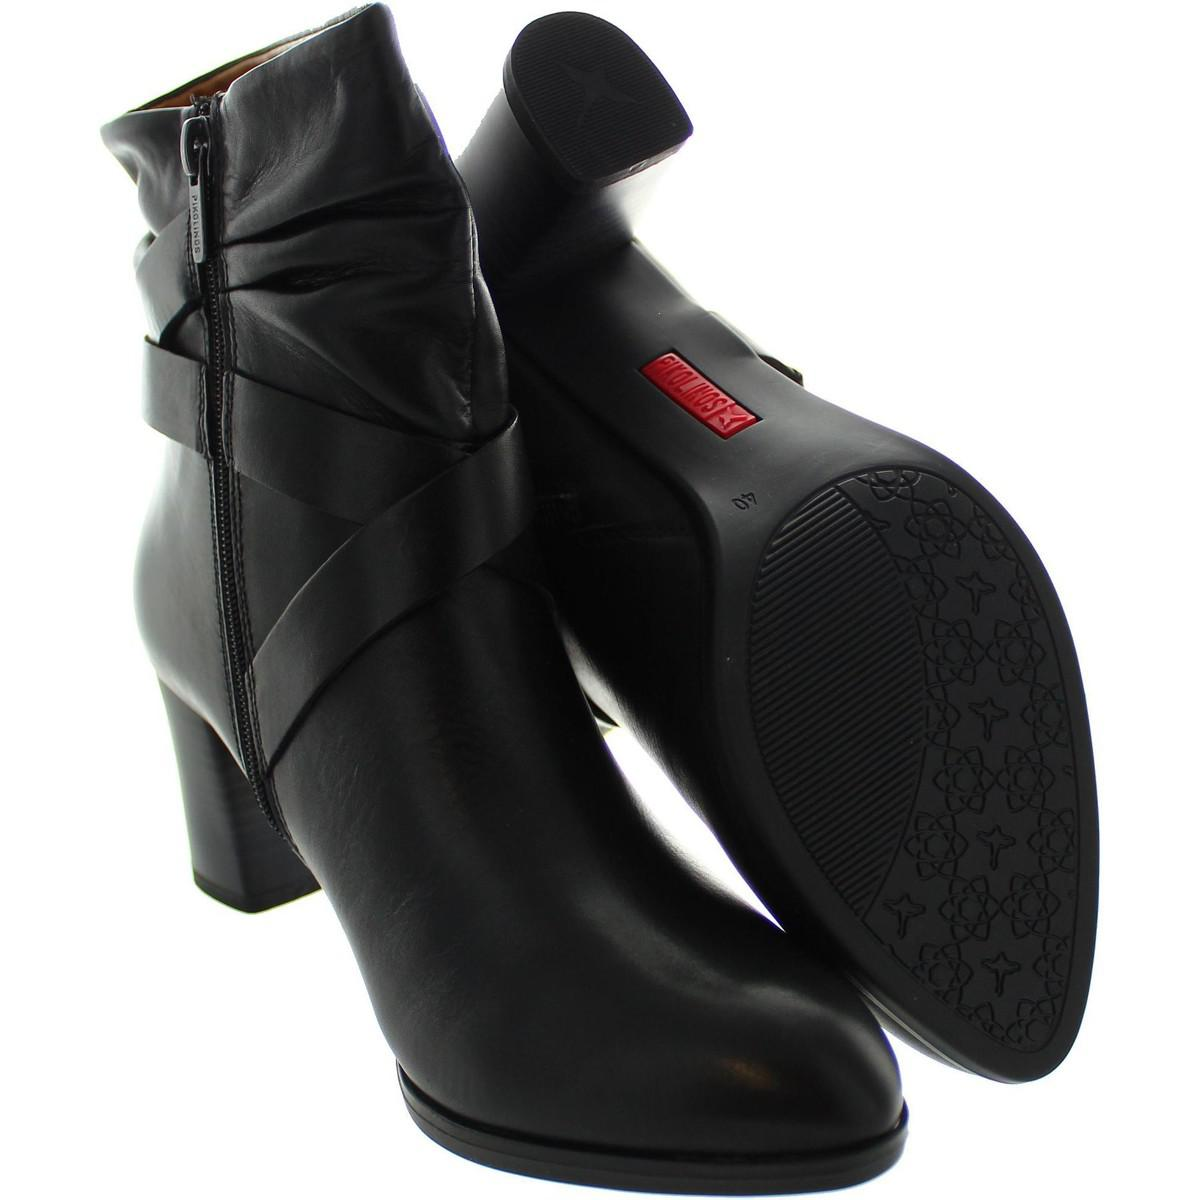 Pikolinos W3n-8956 Women's Low Ankle Boots In Black